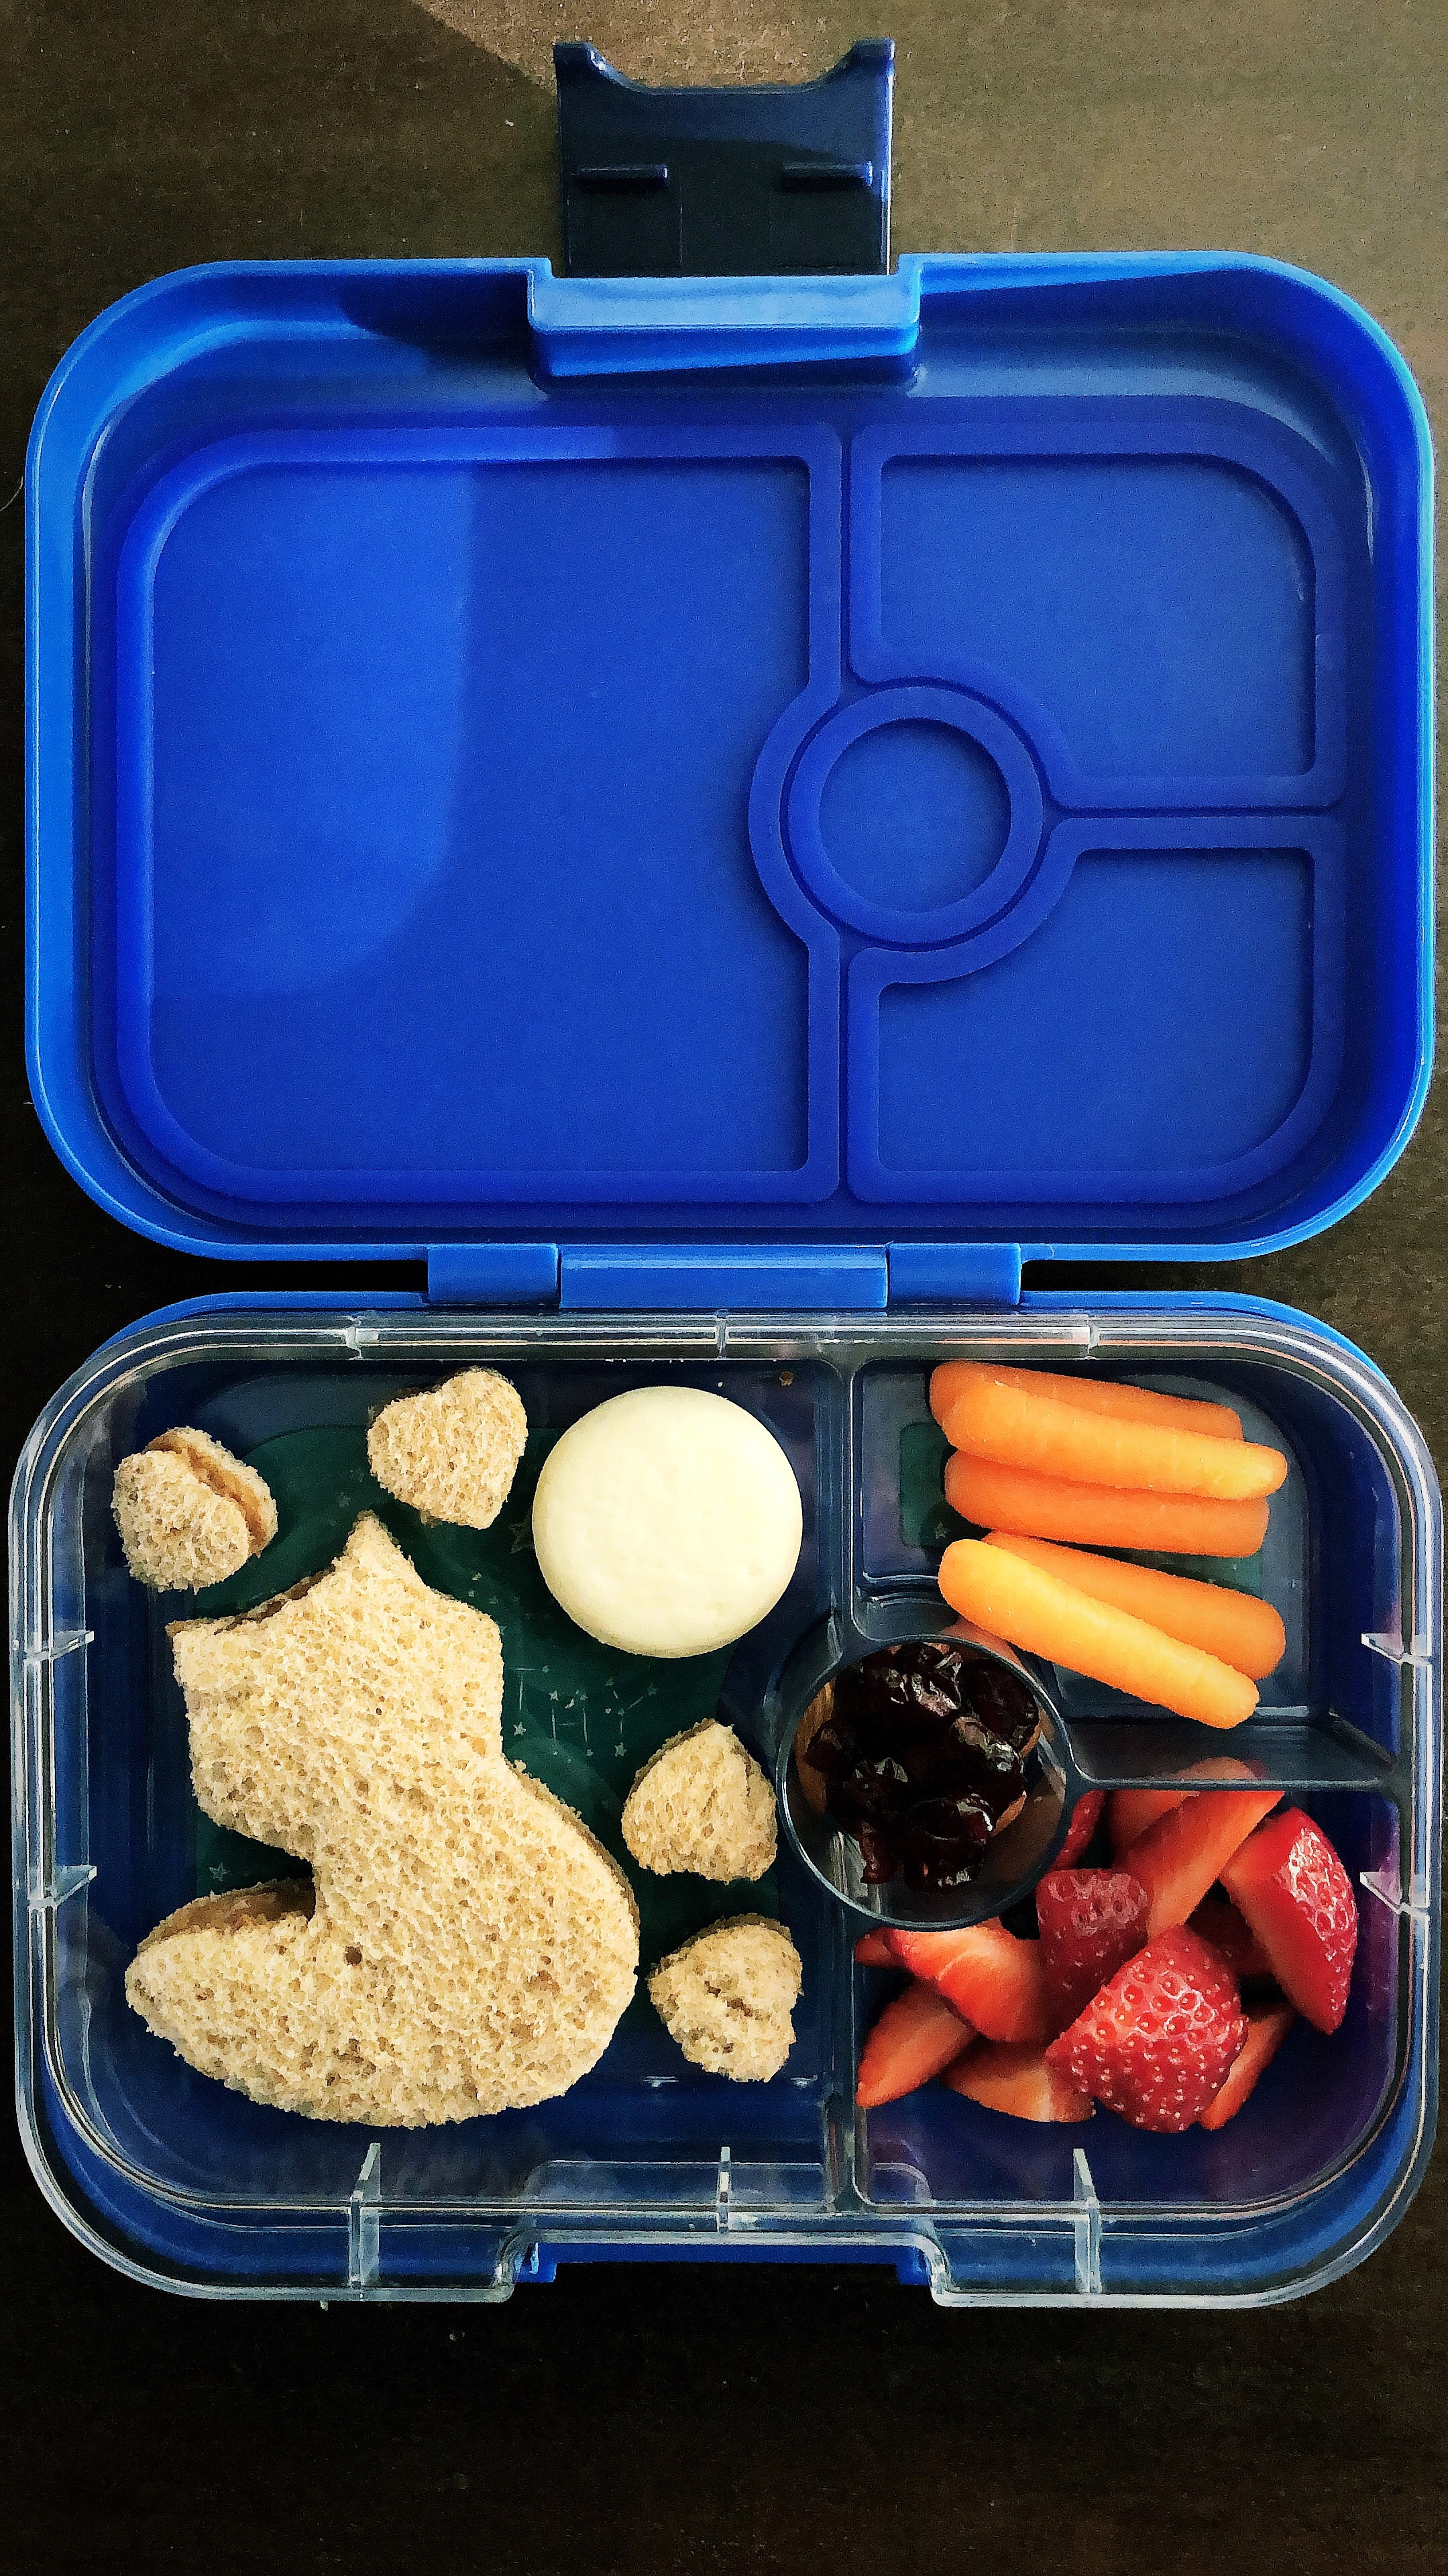 clm-toddler-bento-box-lunch-jan-8